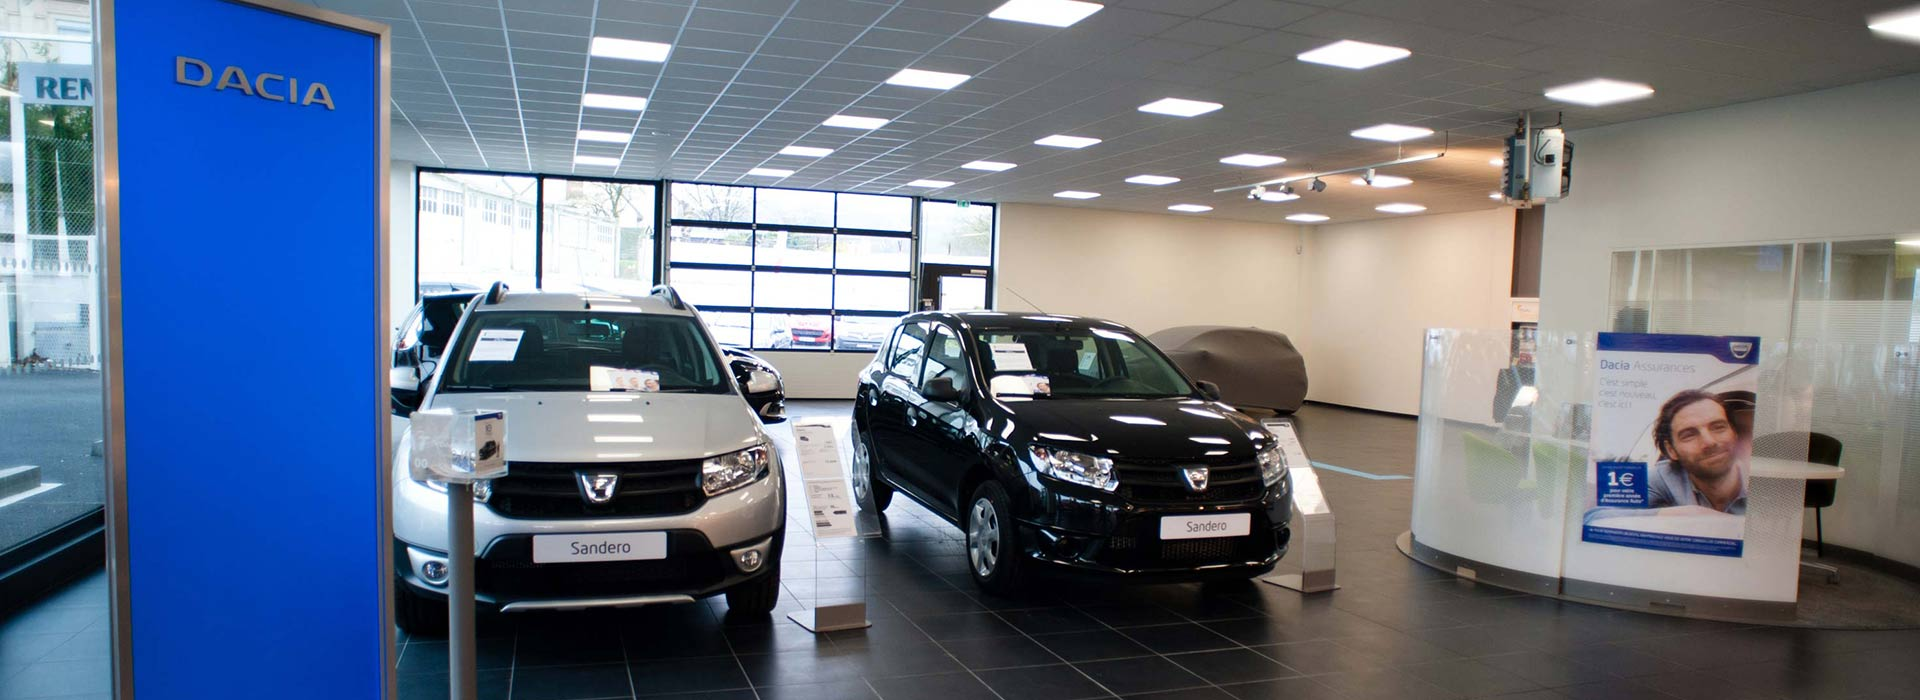 Dacia hirson concessionnaire garage aisne 02 for Garage volkswagen hirson